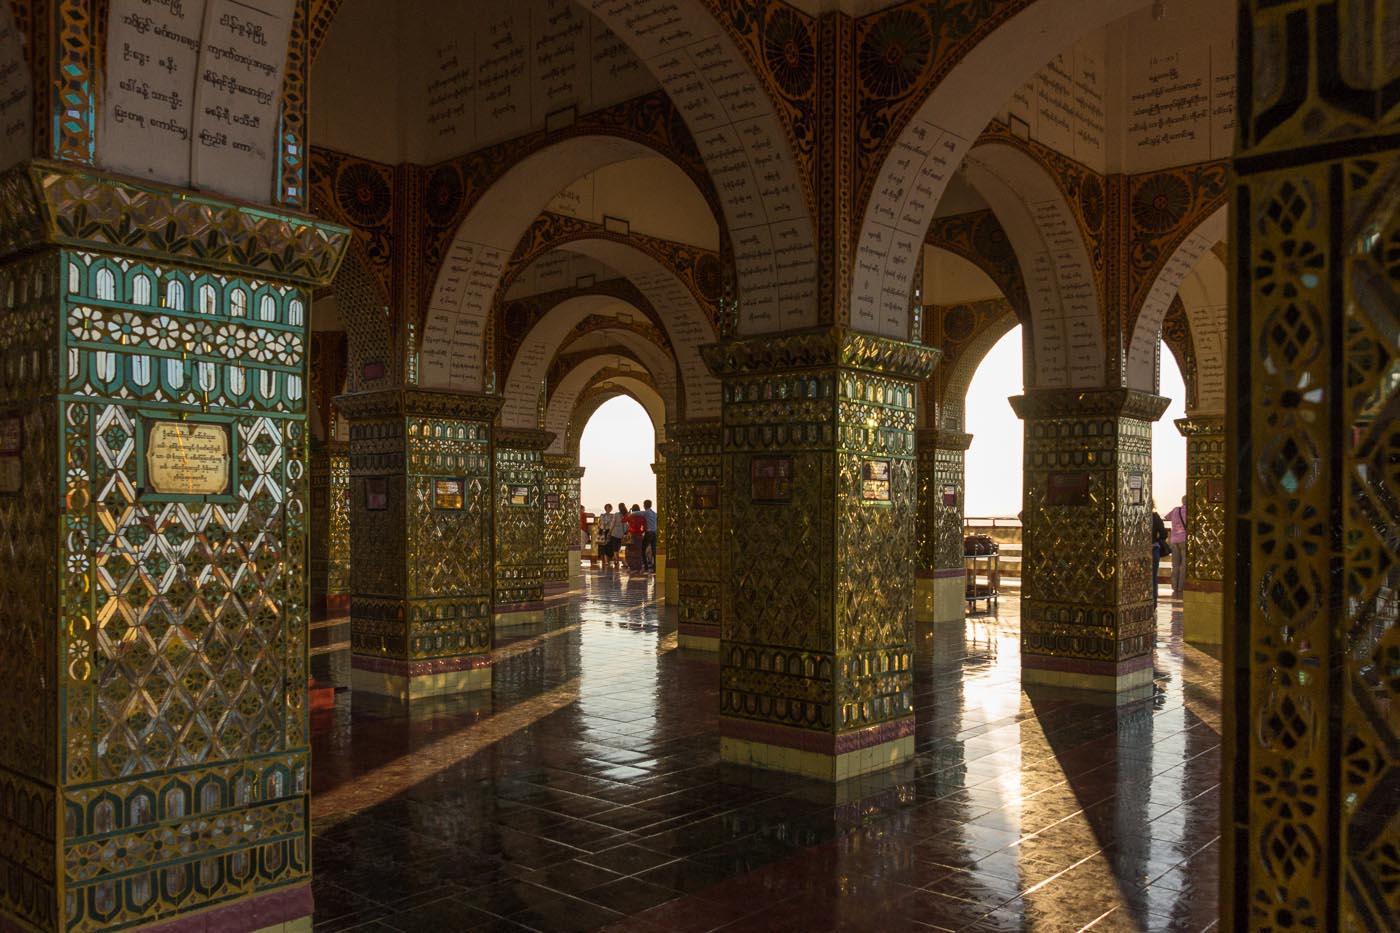 Mandalay Hill Pagoda U2013 The Interior Arches